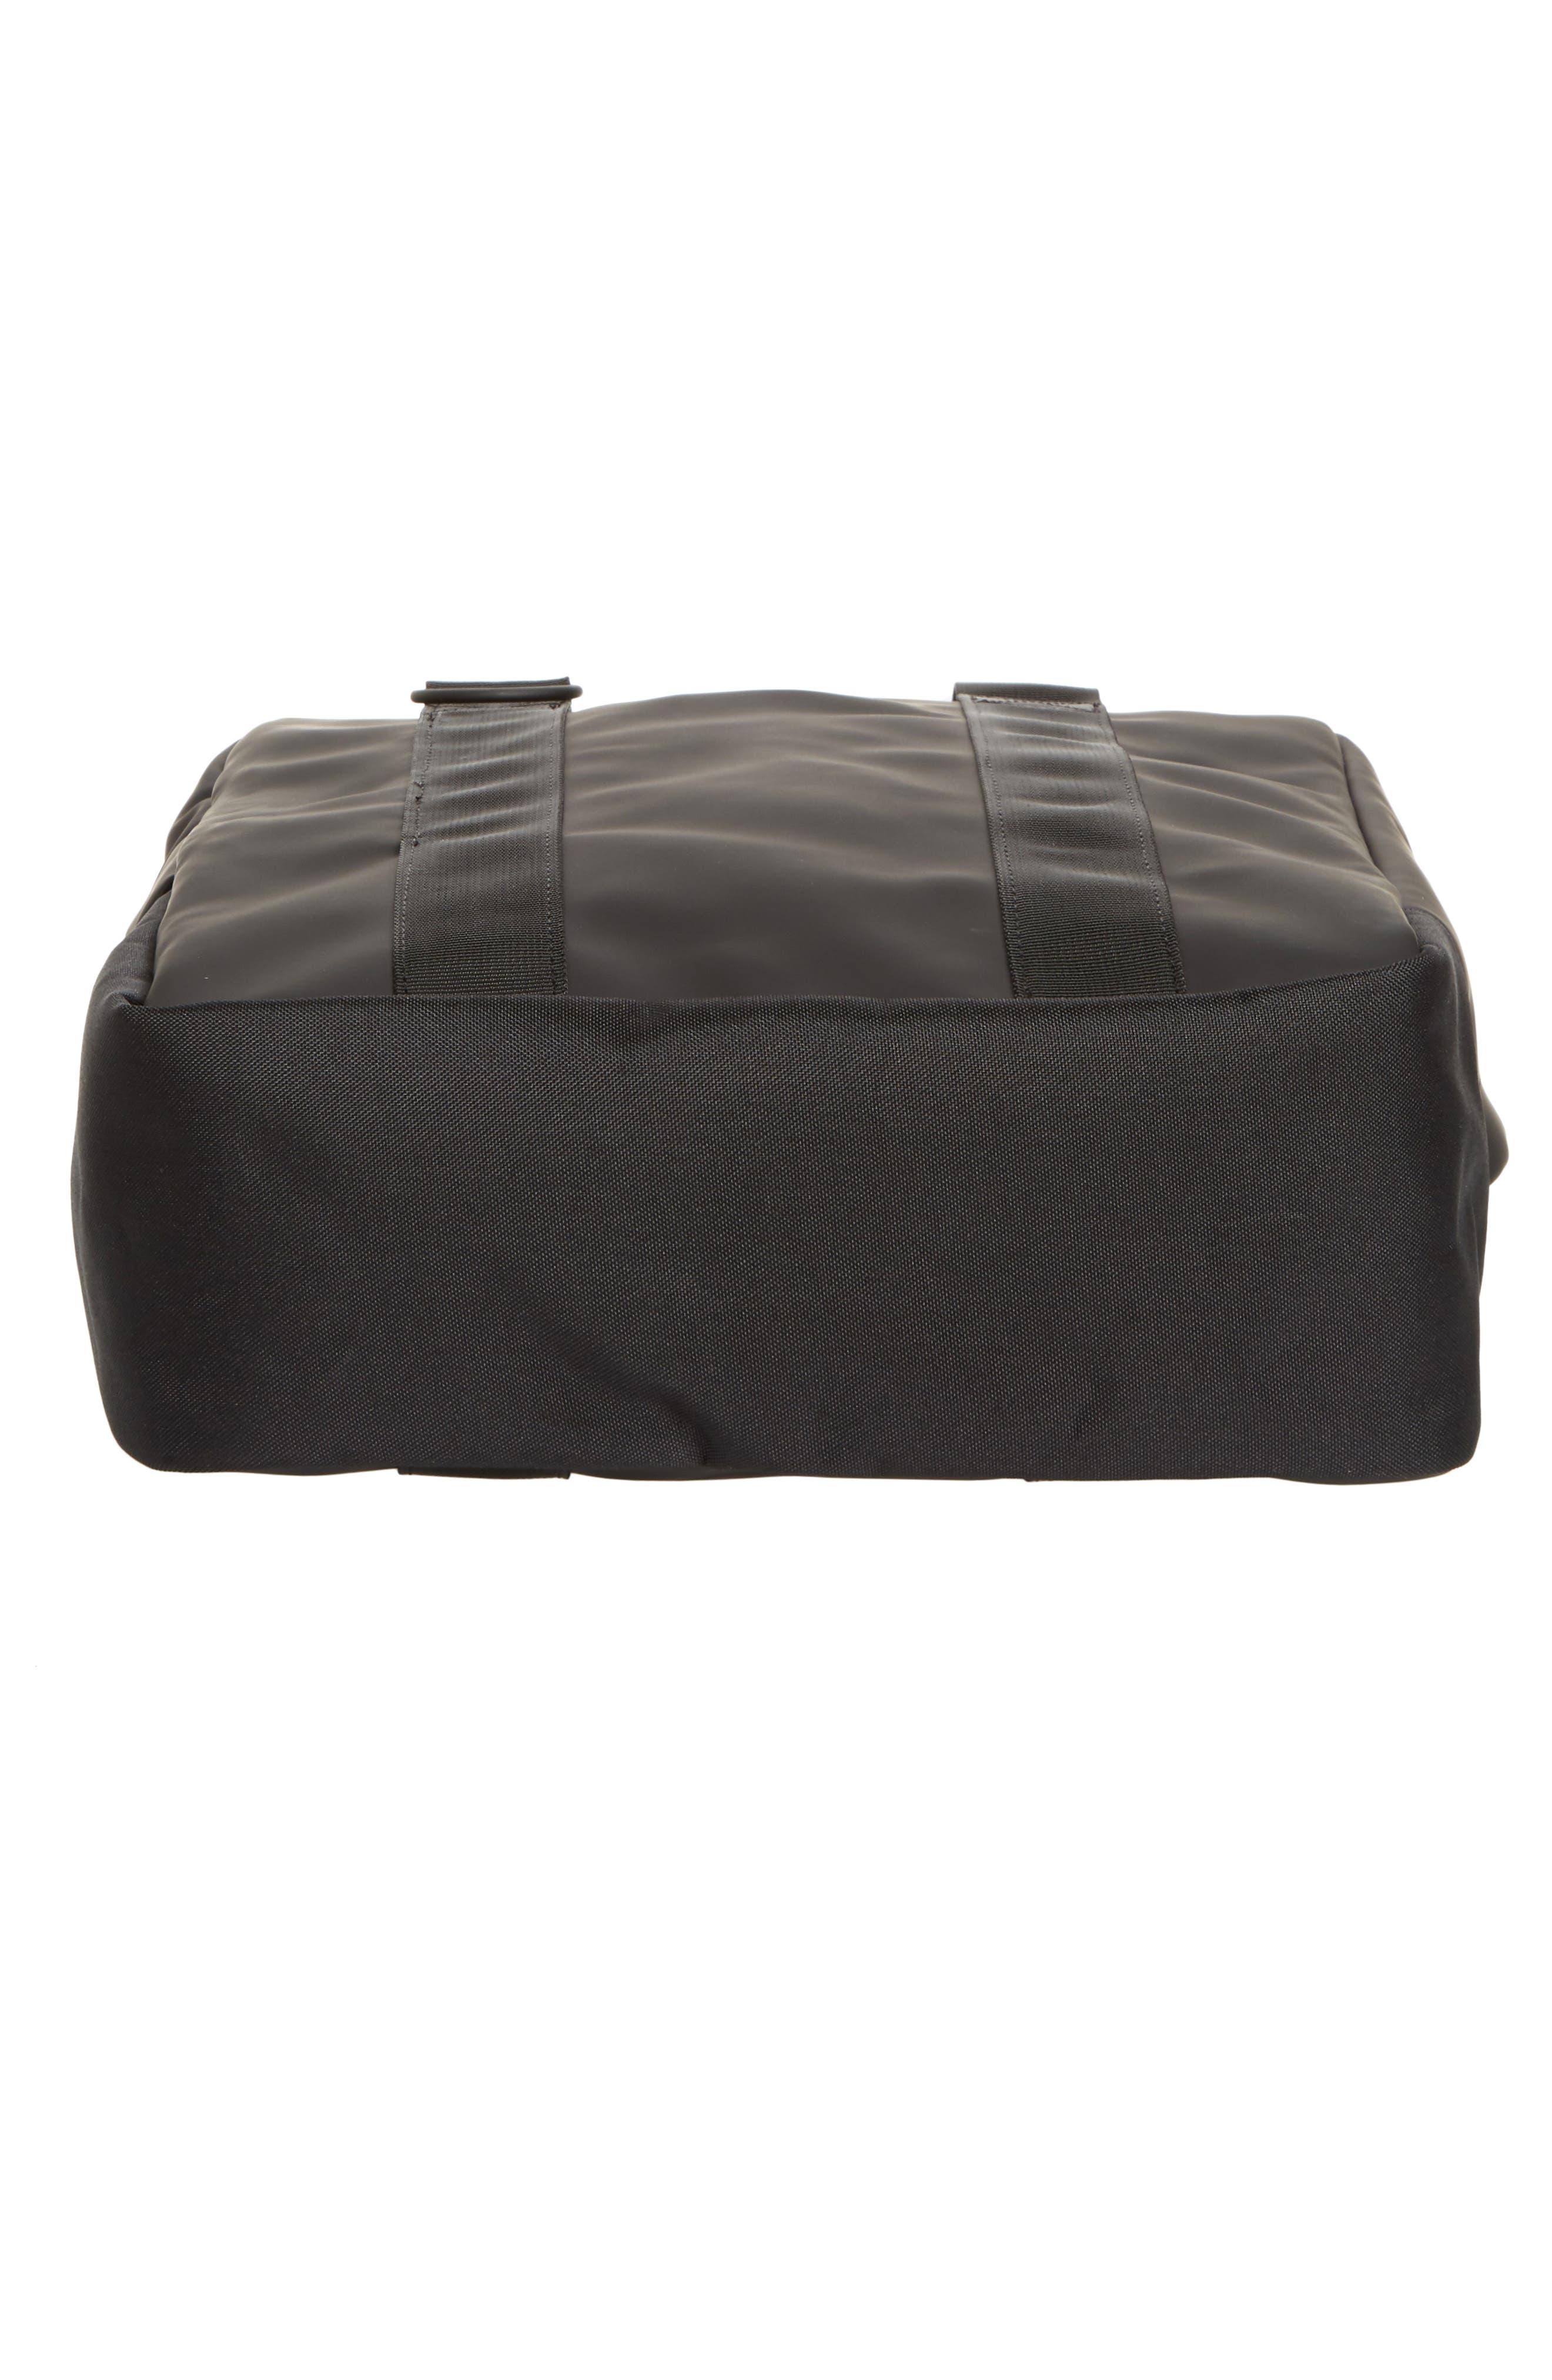 Waterproof Utility Tote Bag,                             Alternate thumbnail 6, color,                             BLACK